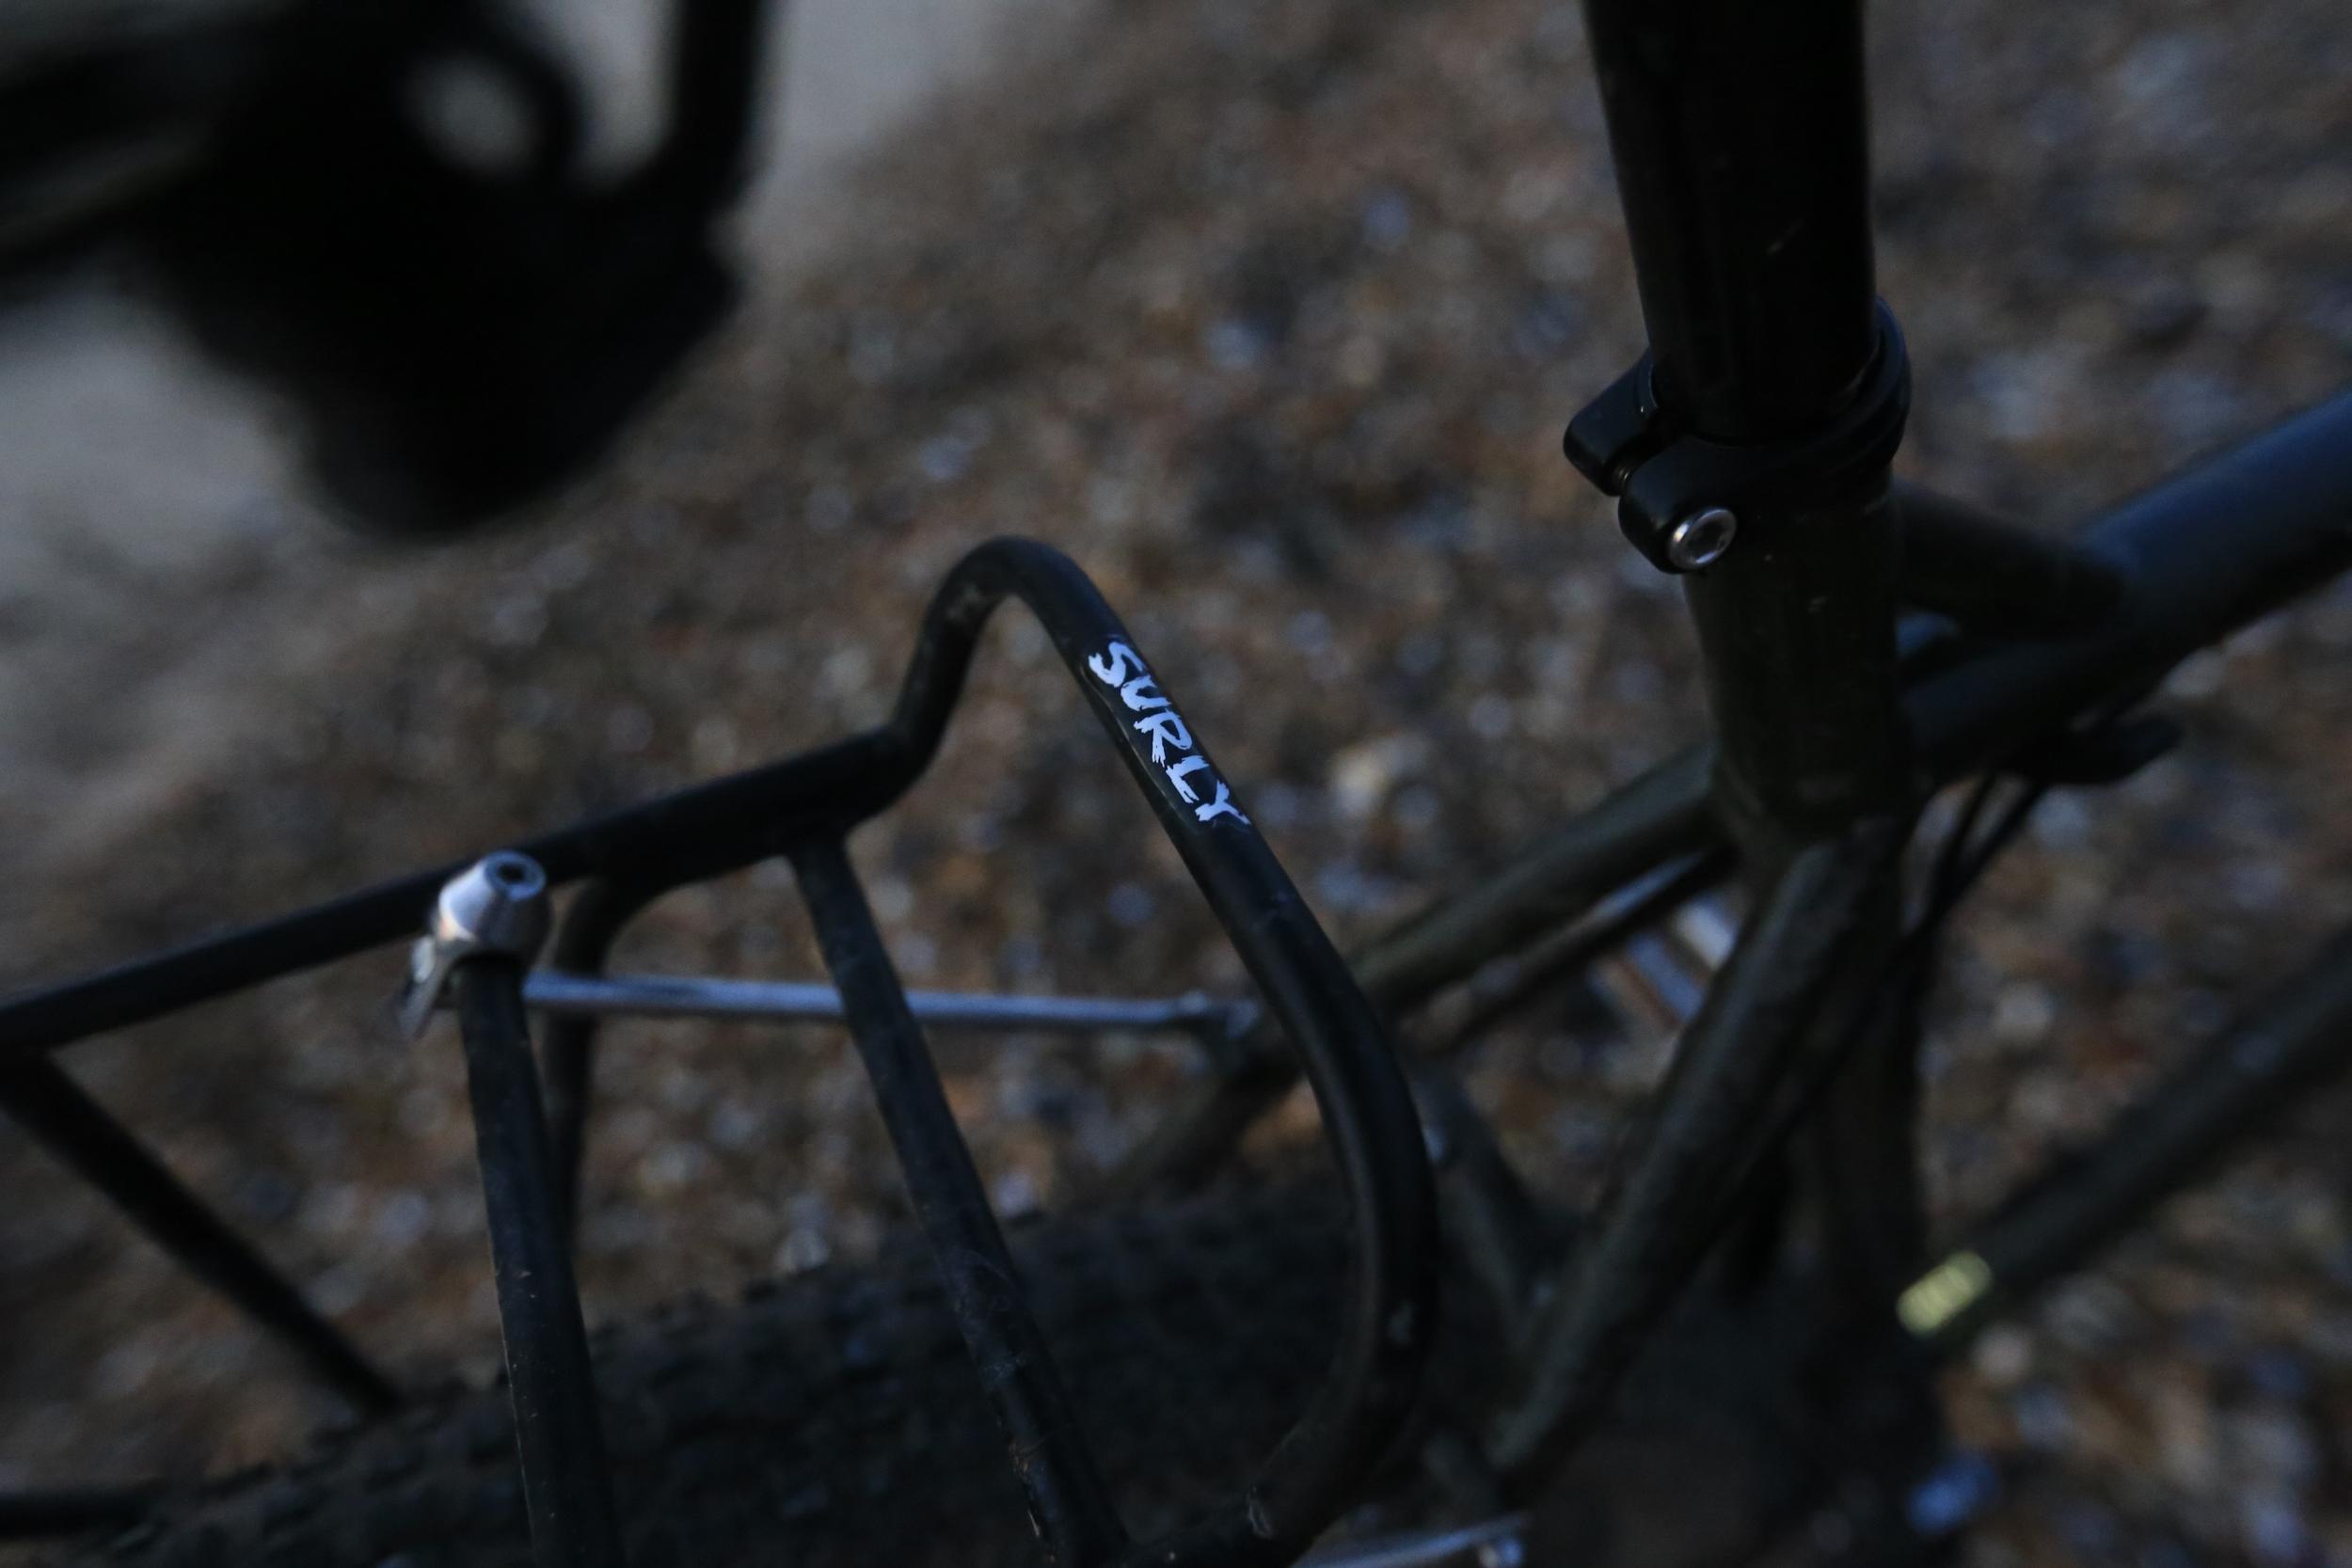 surly, surly ecr, ecr, bikepacking, travel blog, bicycle touring blog, cycling blog, bicycle touring apocalypse, berghaus, wildcat gear, revelate designs, pedaling nowhere